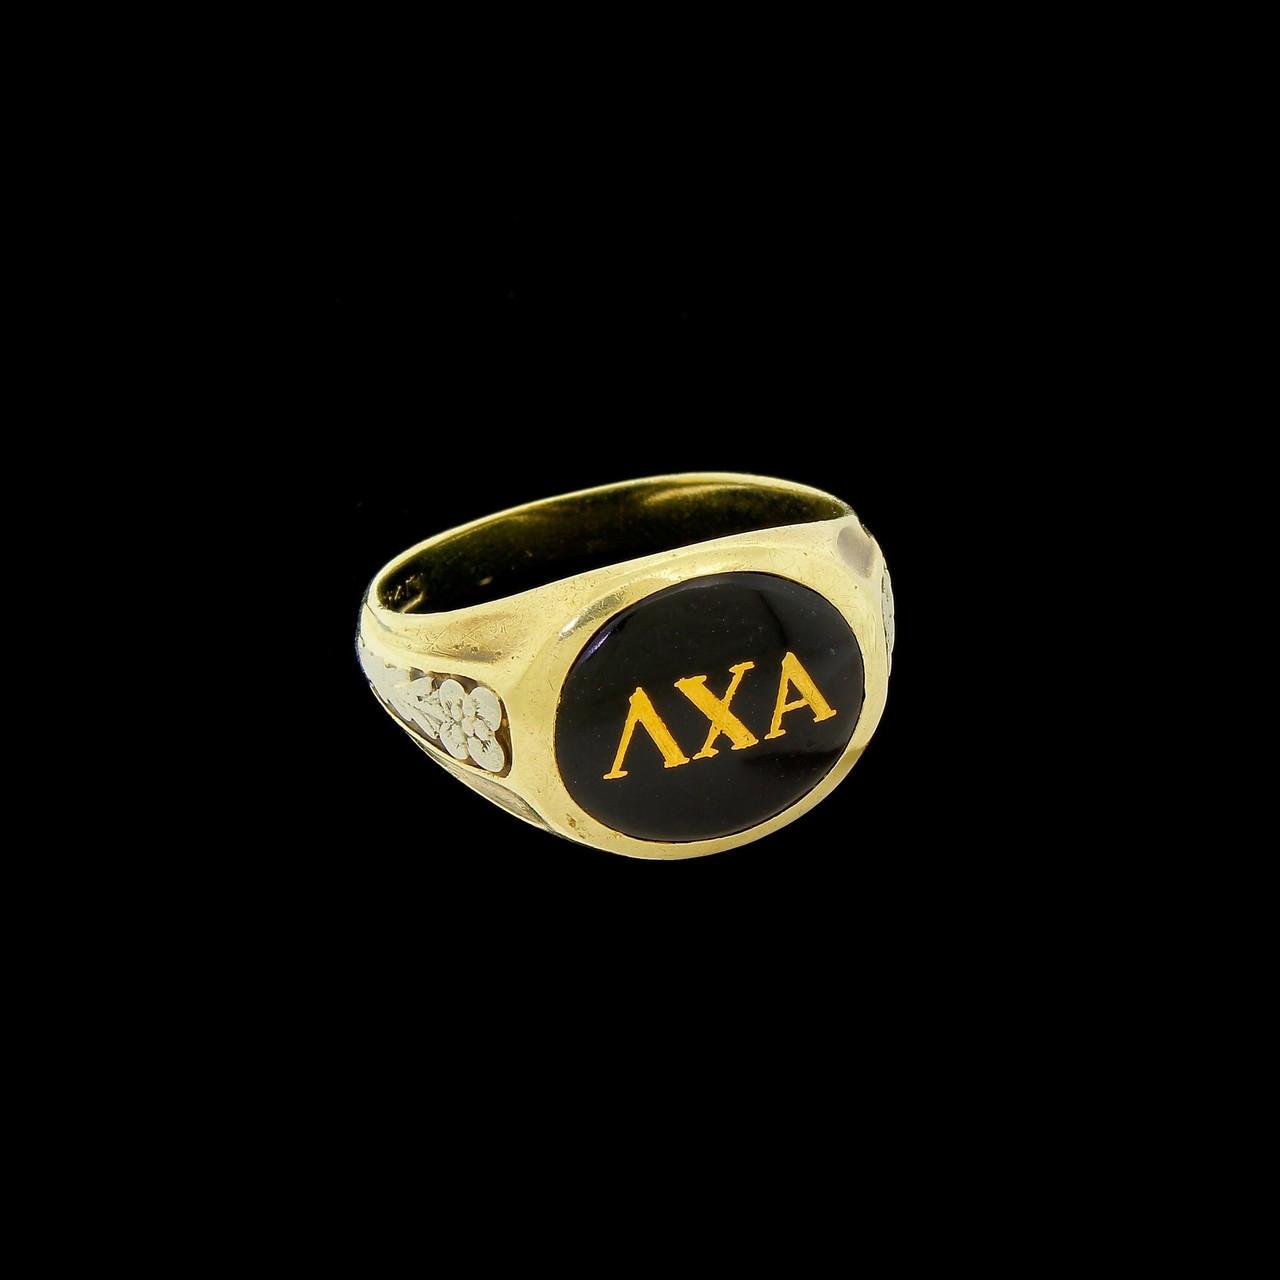 Early Vintage Art Deco 14k Gold Lambda Chi Alpha Fraternity